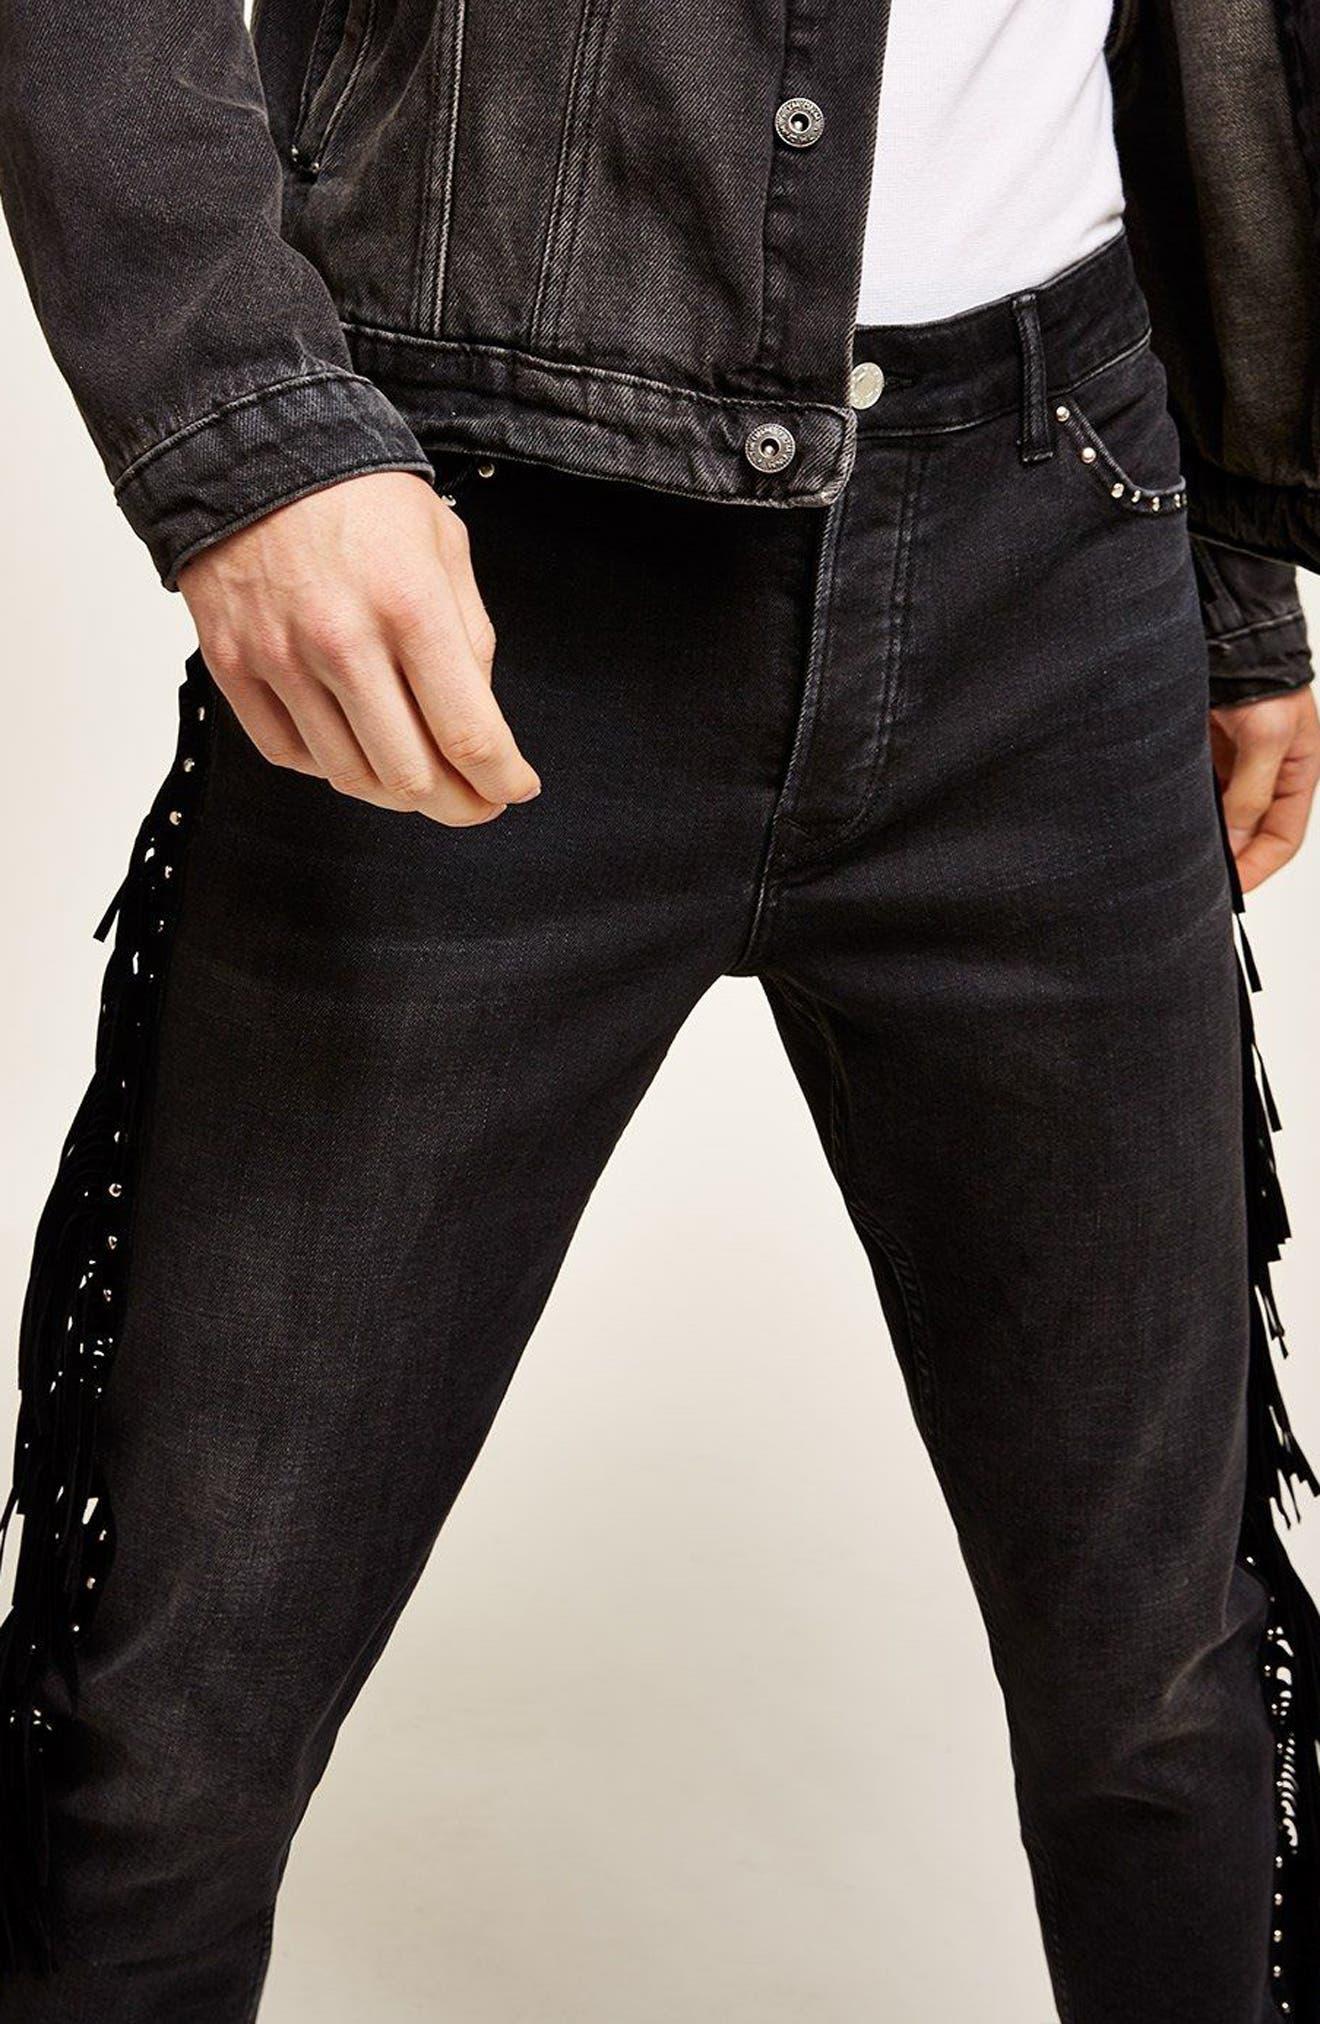 Studded Fringe Skinny Fit Jeans,                             Alternate thumbnail 2, color,                             Black